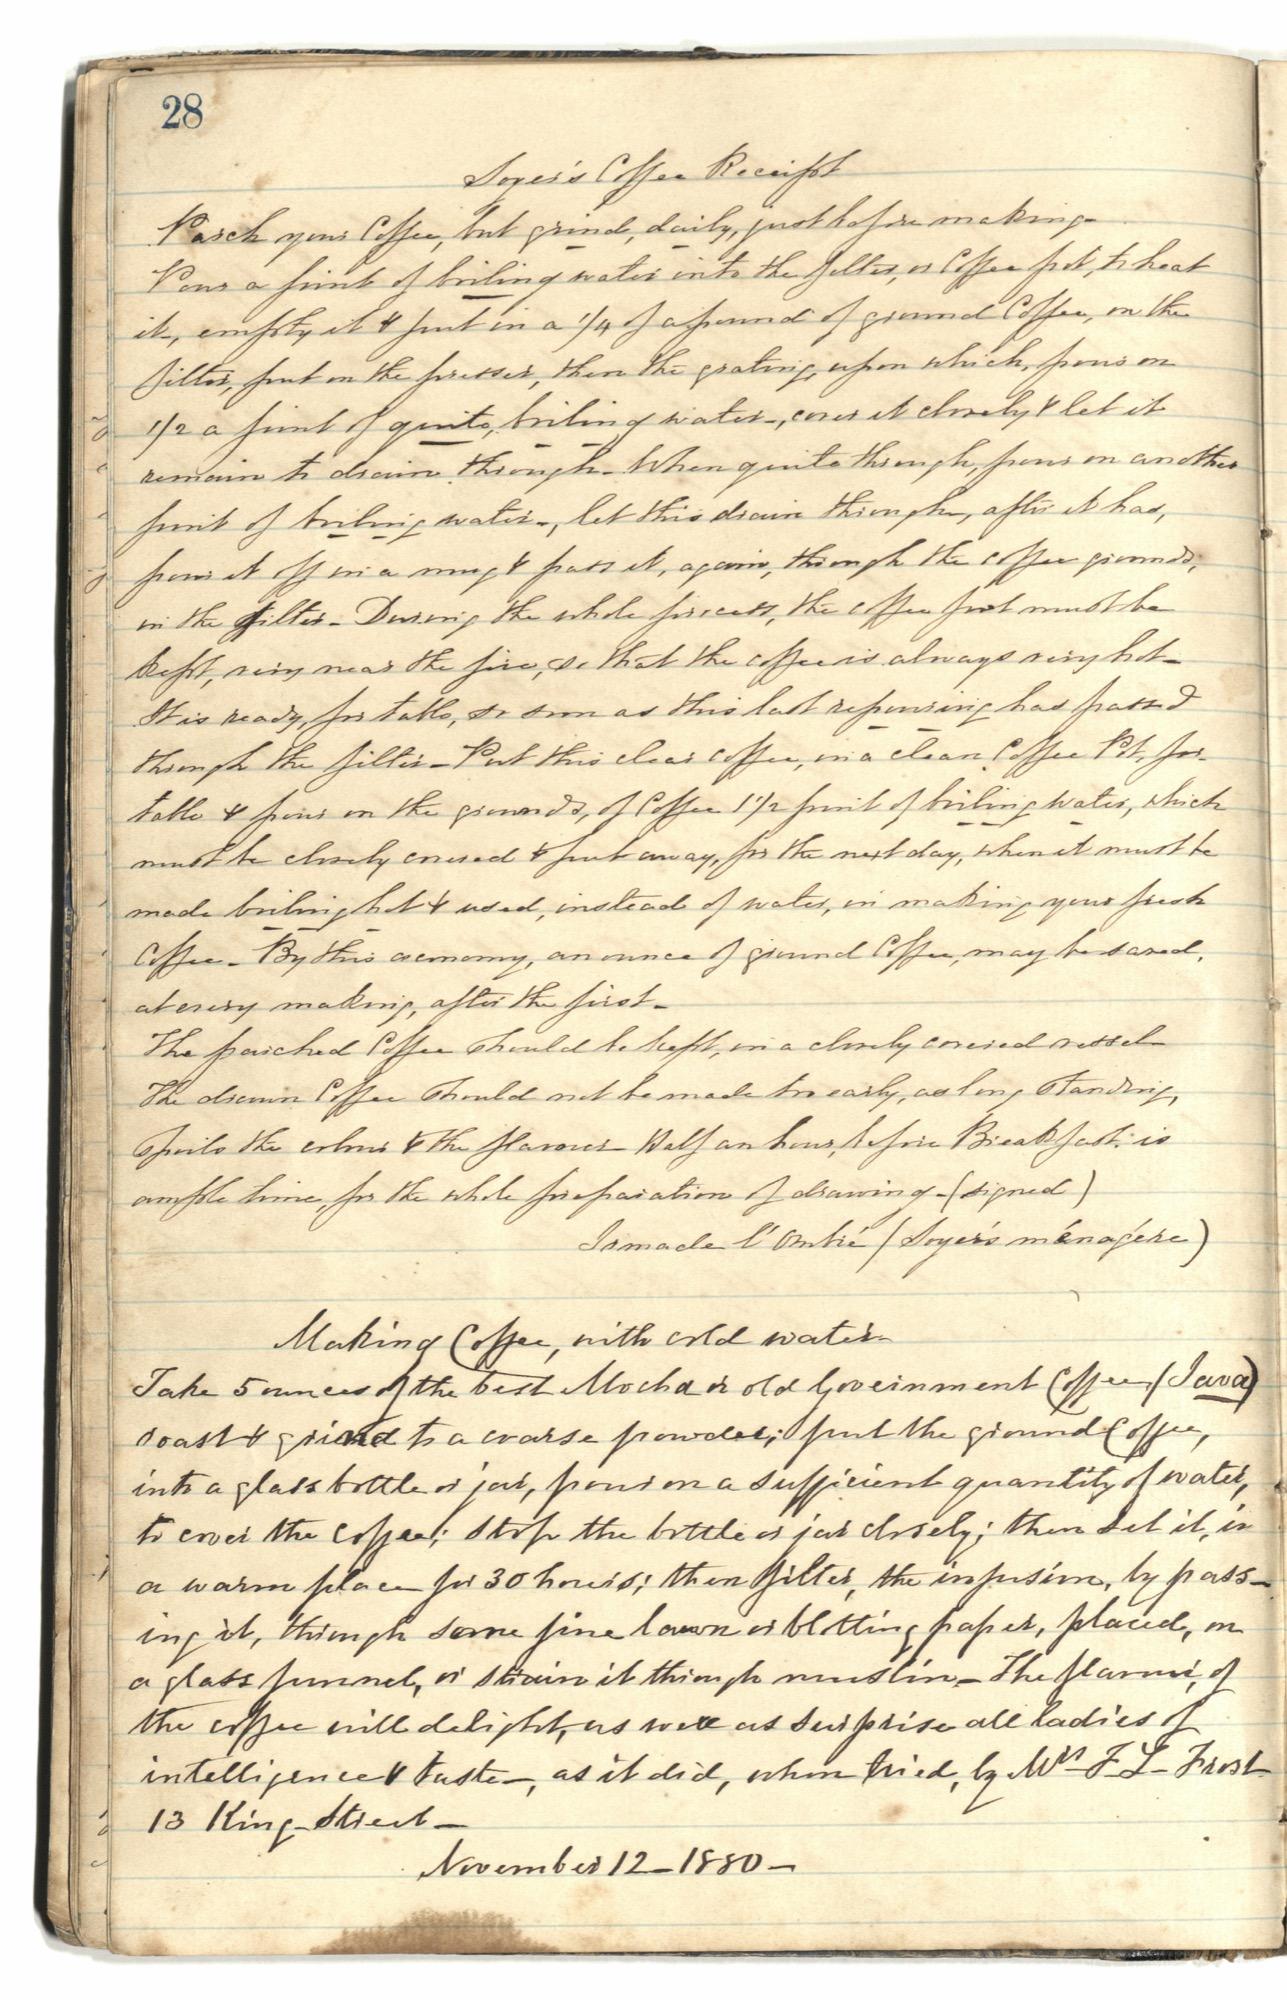 Mary Motte Alston Pringle Receipt Book, Page 32